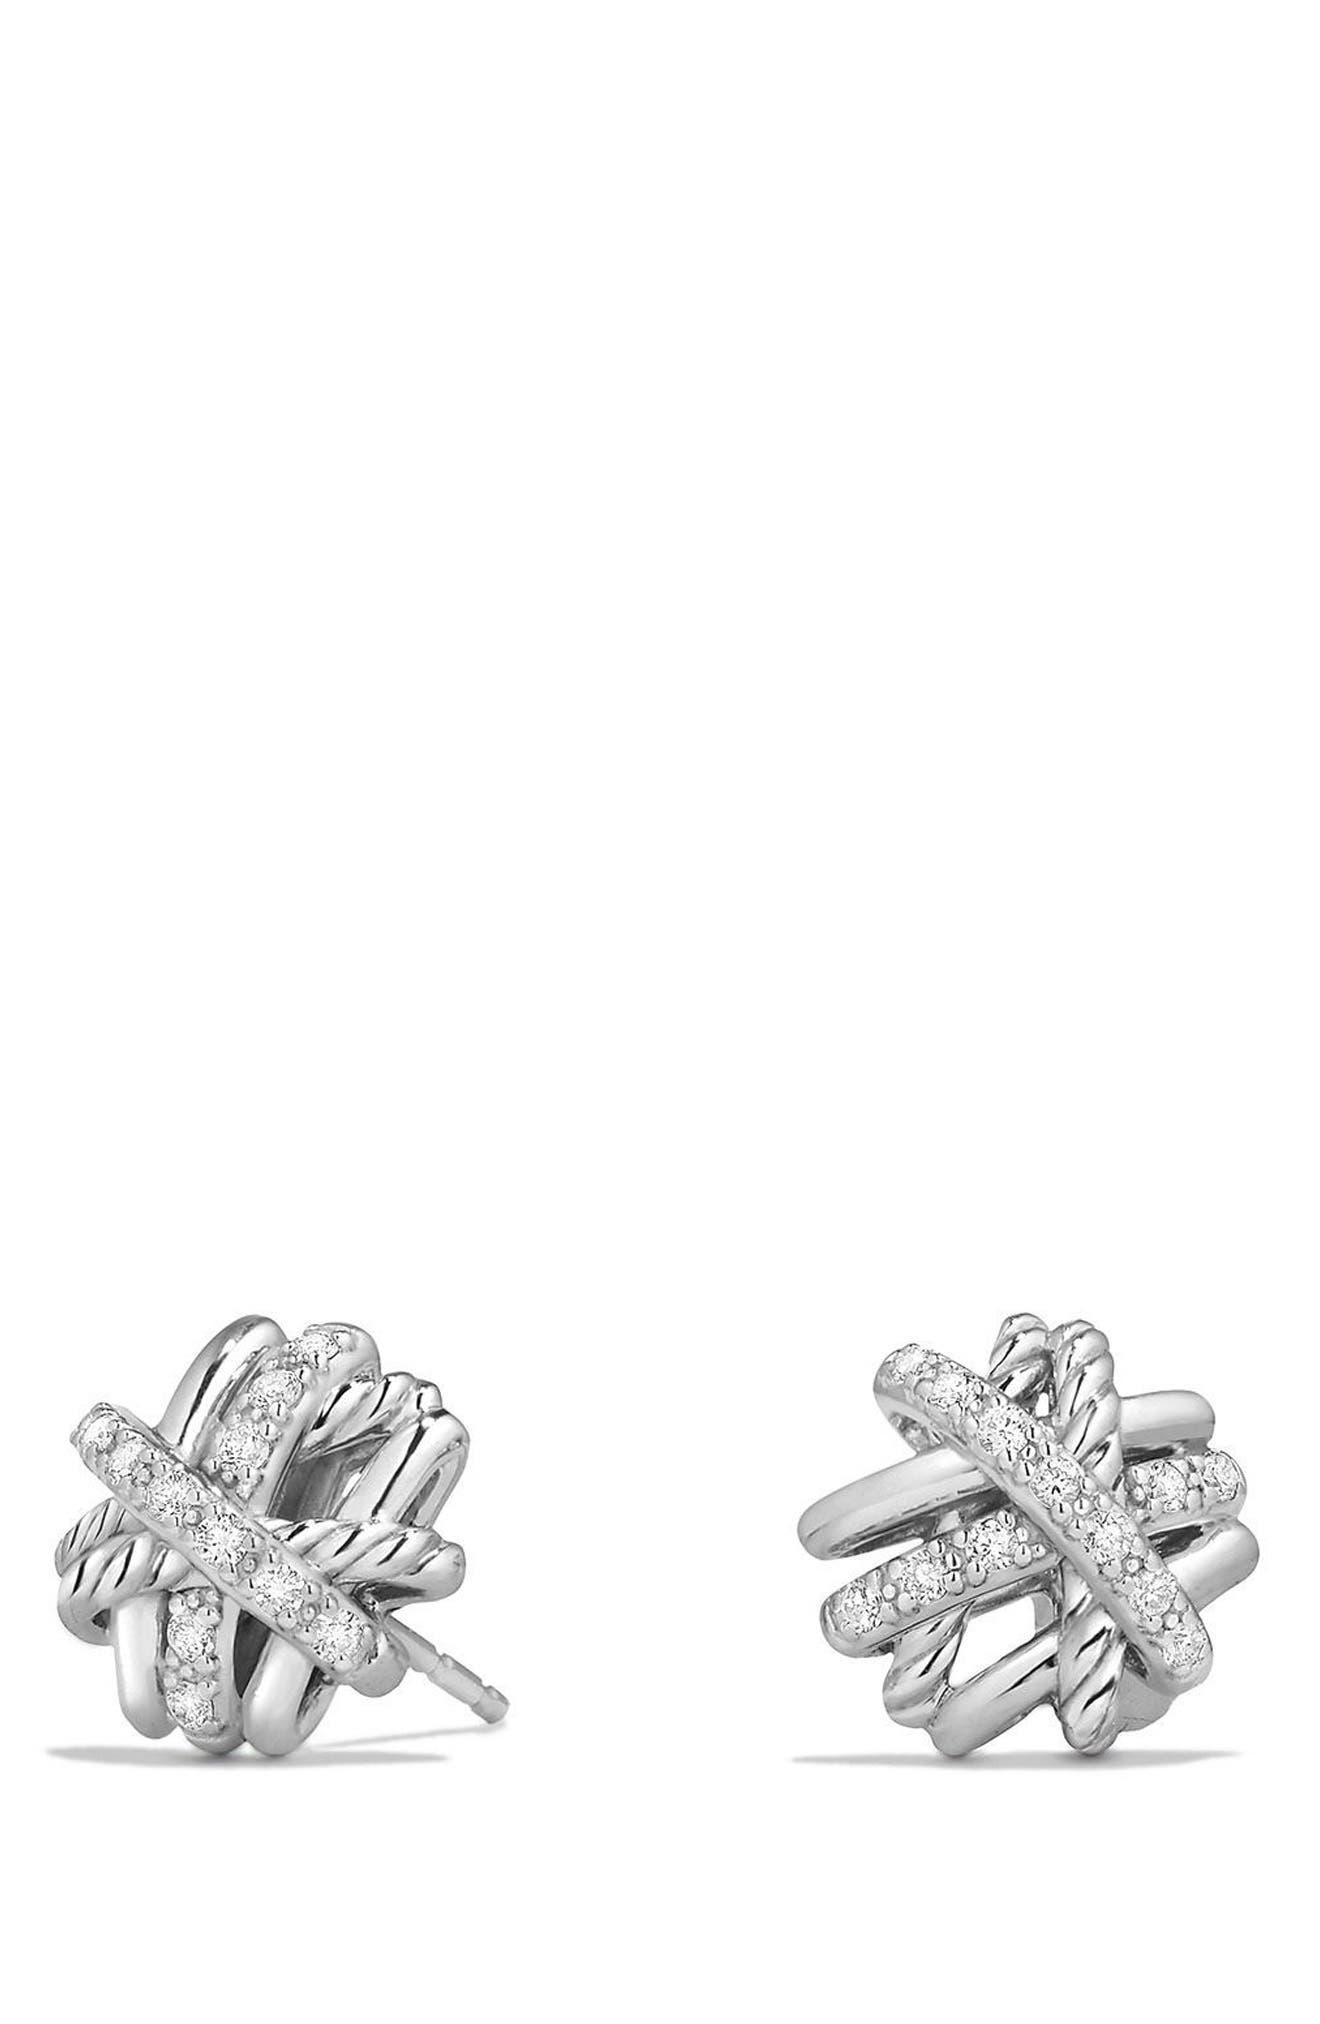 Alternate Image 1 Selected - David Yurman Crossover Stud Earrings with Diamonds